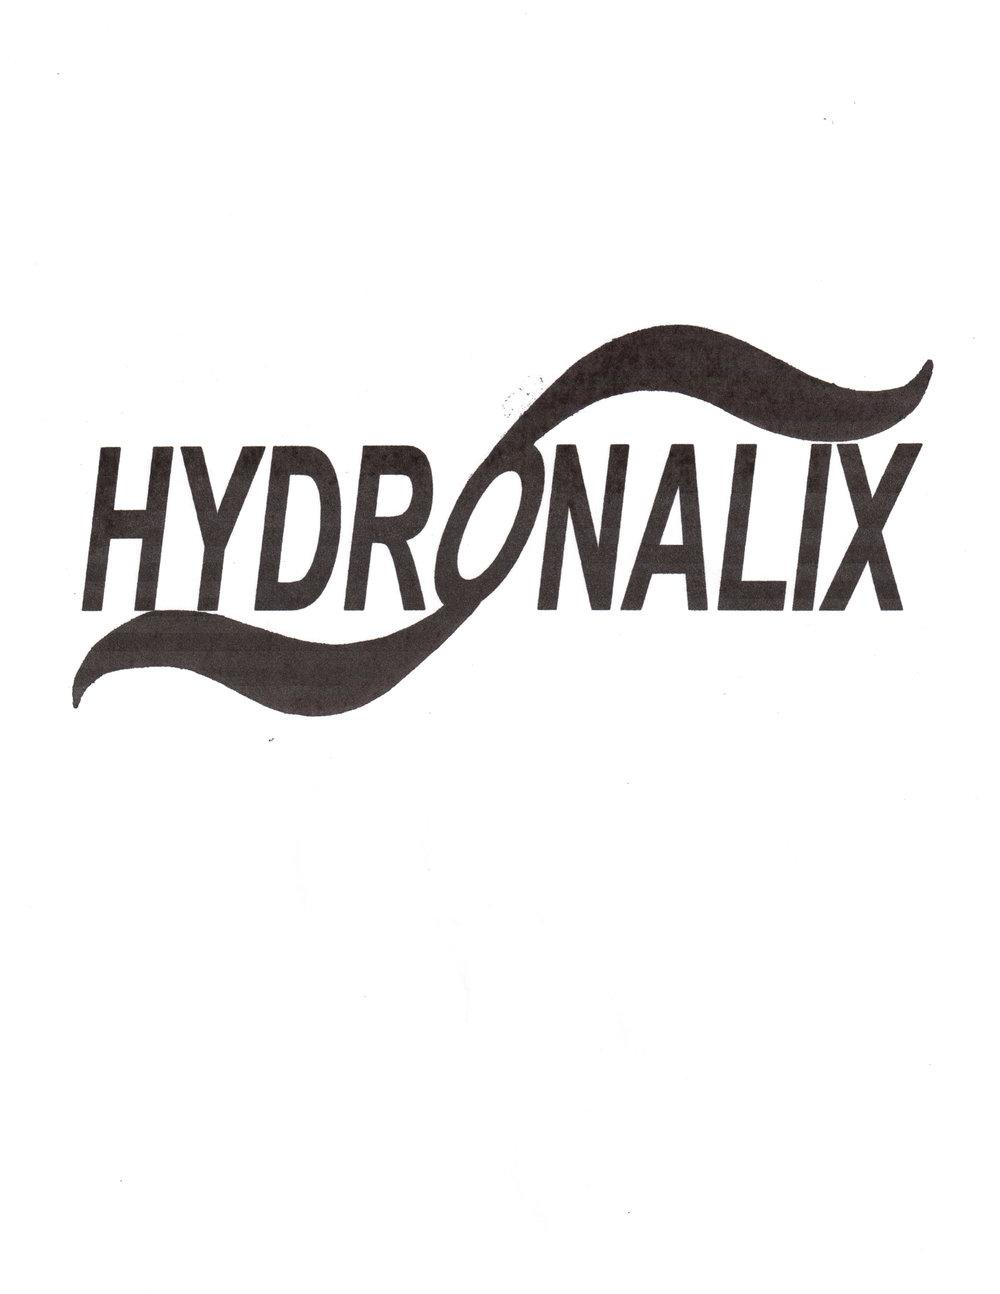 Hydronalix.jpg